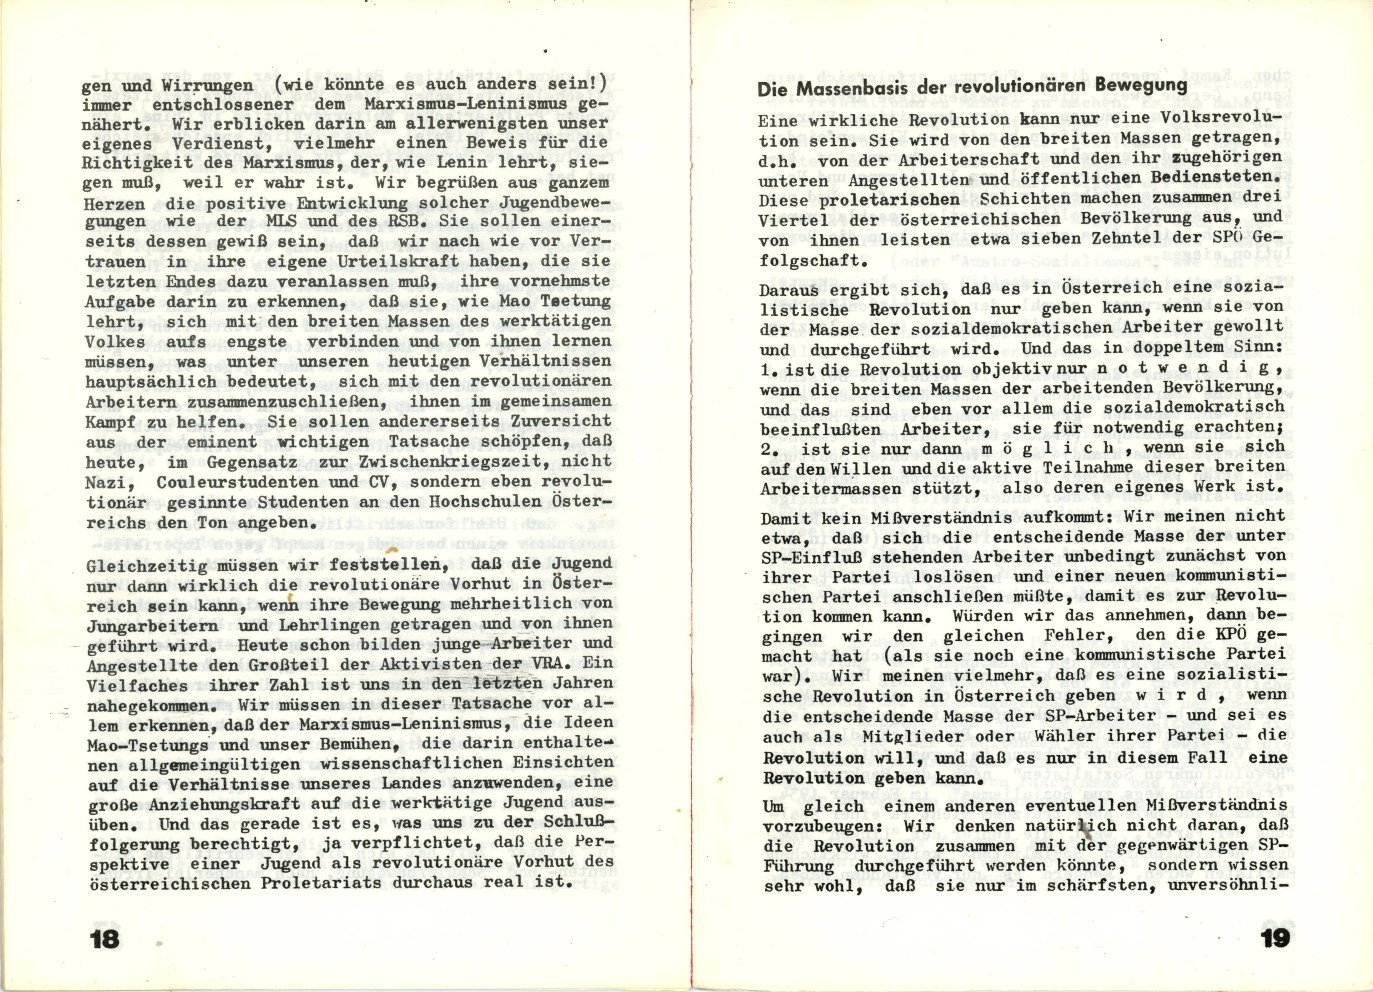 VRA_Perspektiven_1975_11